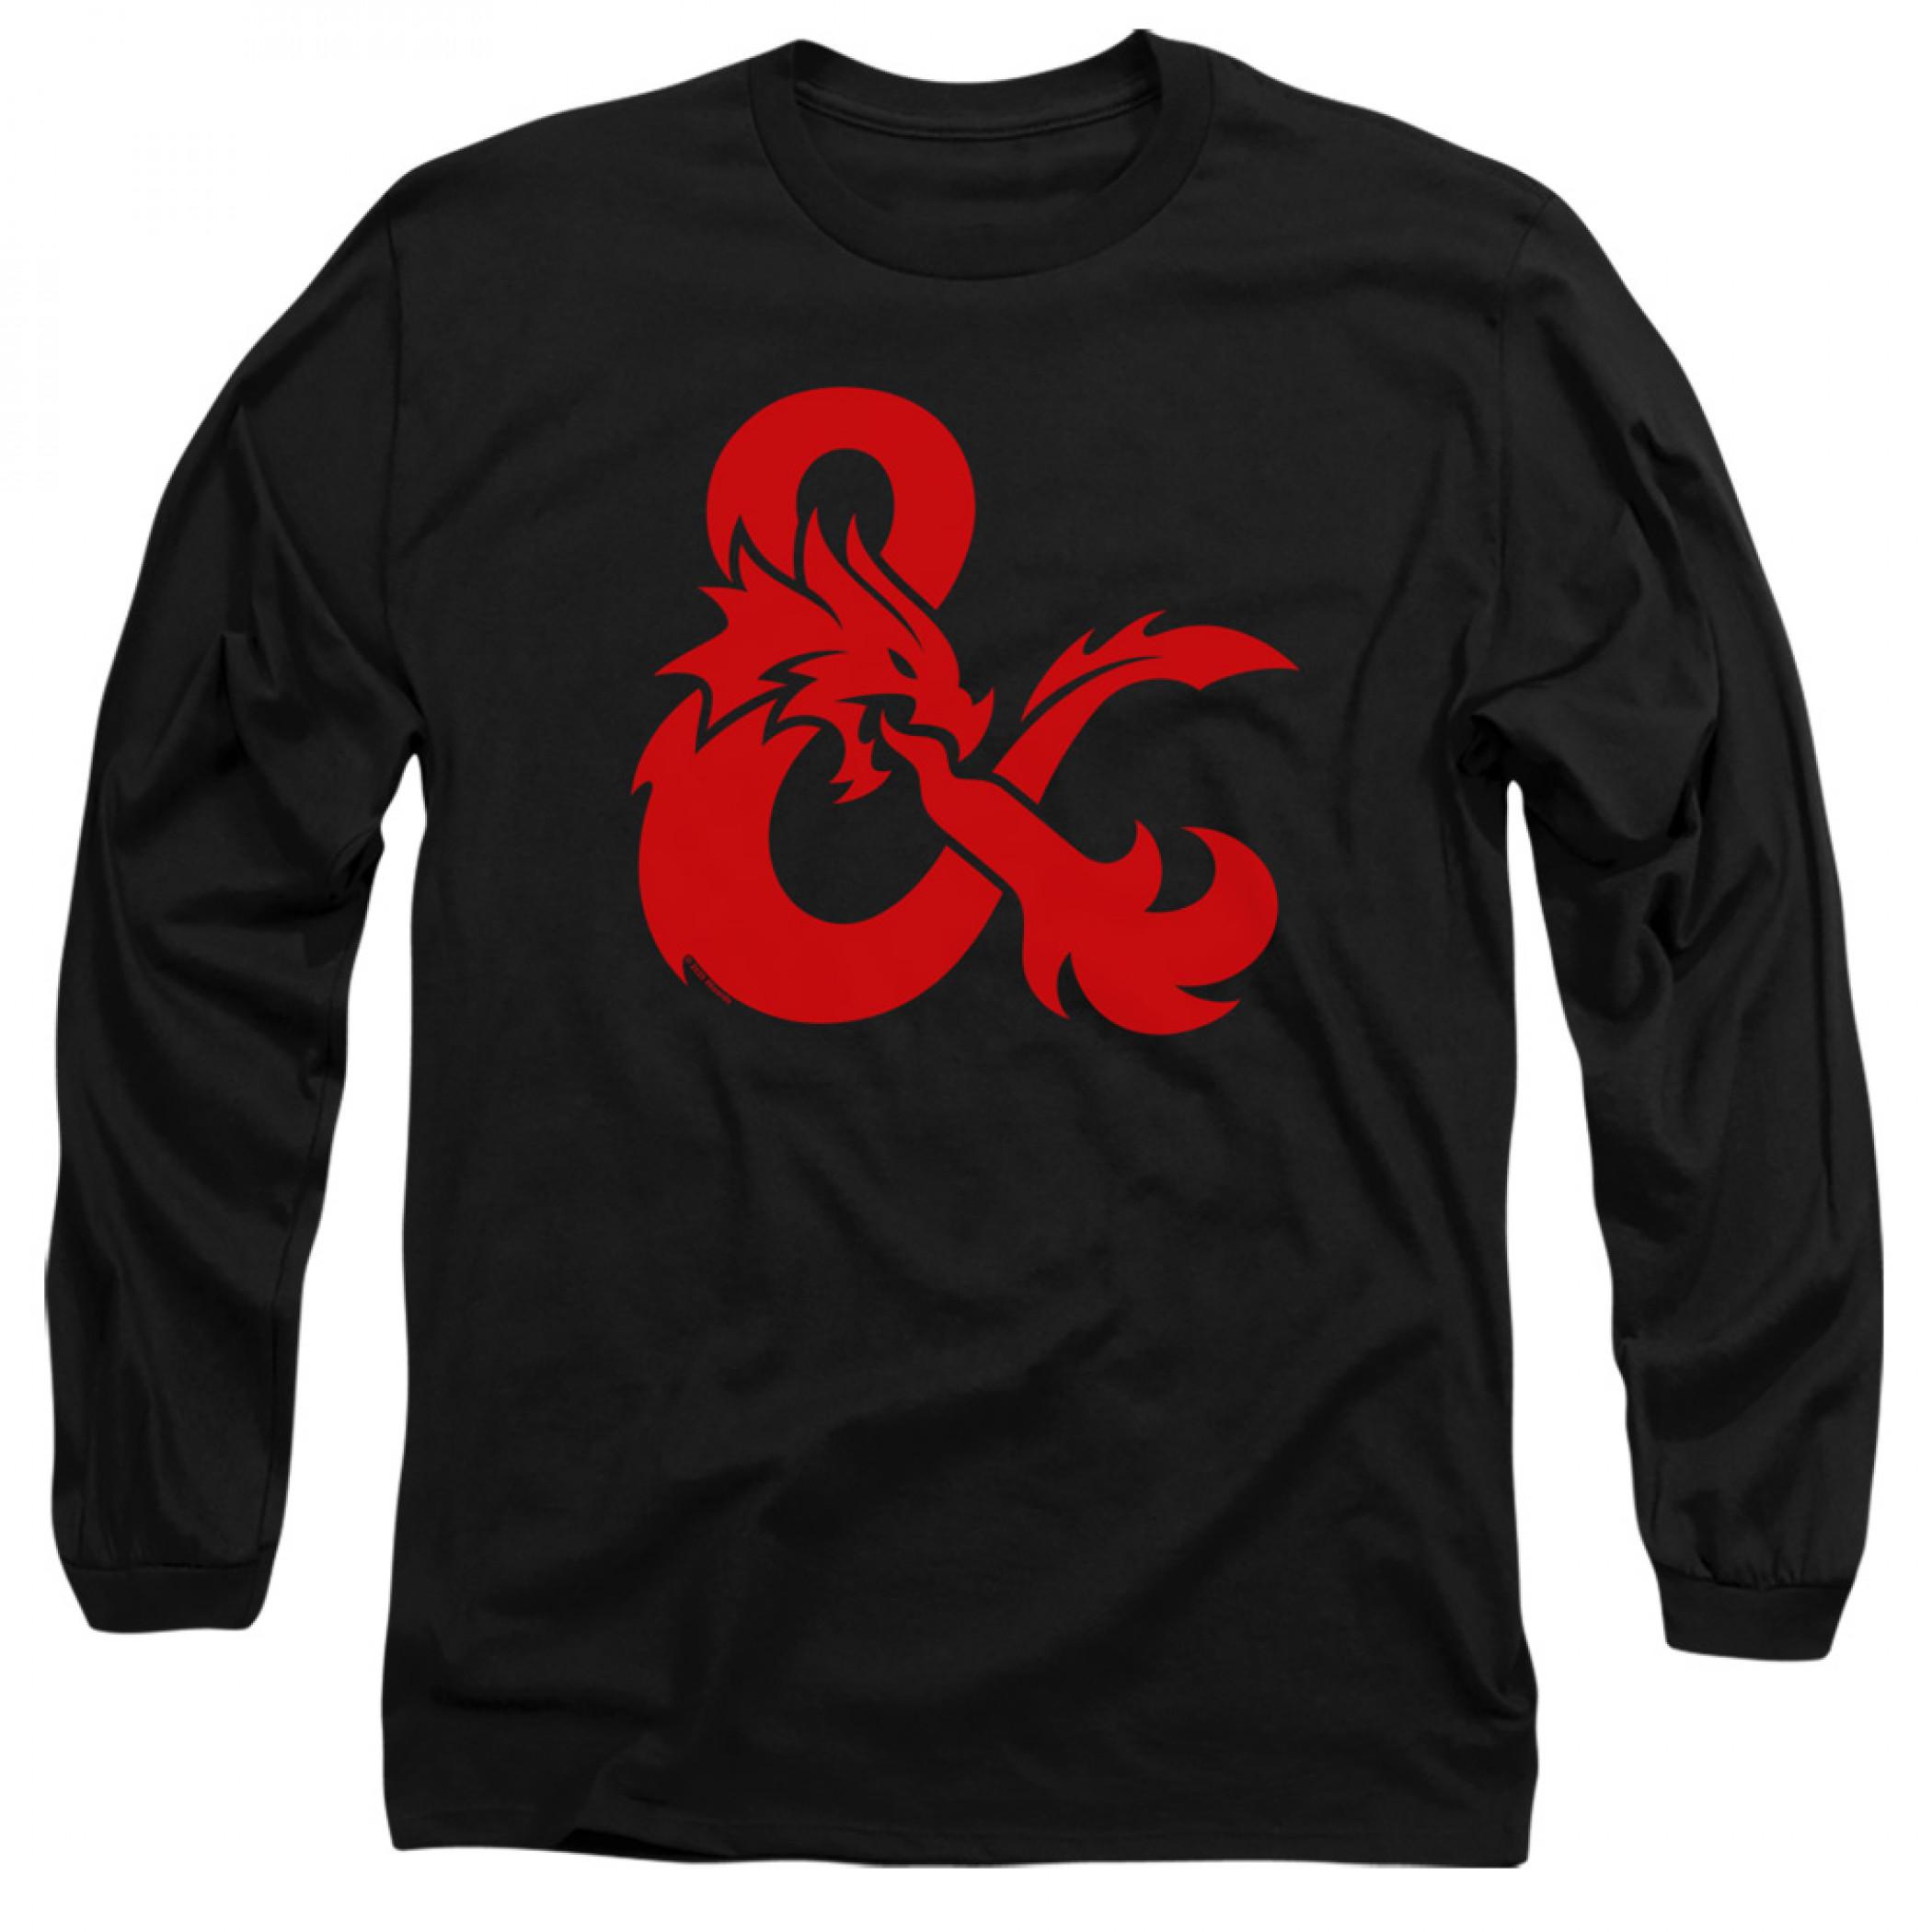 Dungeons & Dragons Ampersand Logo Long Sleeve Shirt